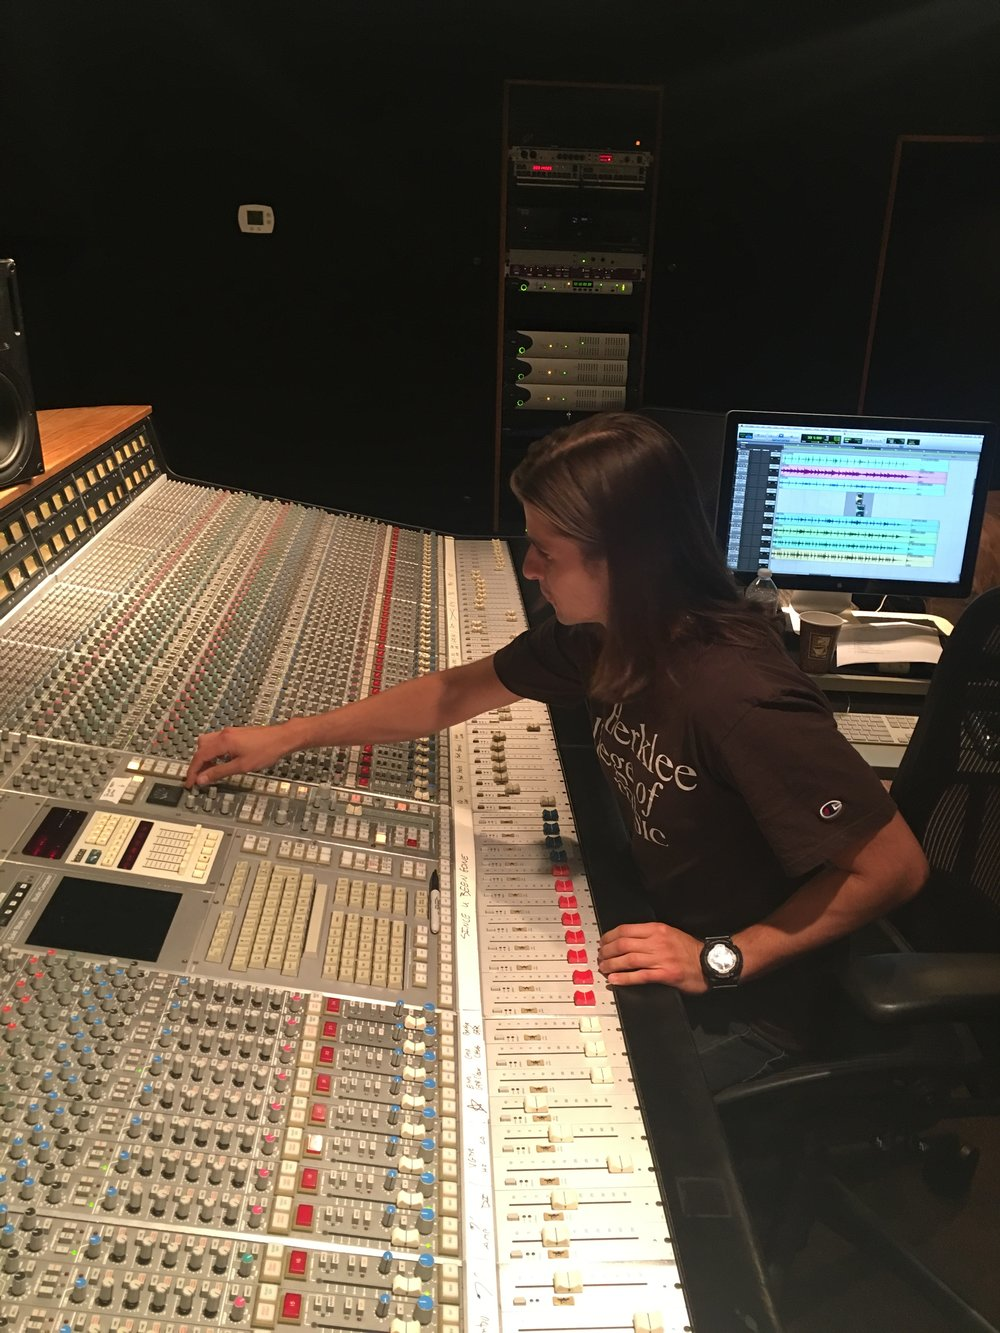 TONAH-Calderon-Music-Film-Composer-Producer-Dance-Pop-Electronic-Berklee-College-Of-Music-06